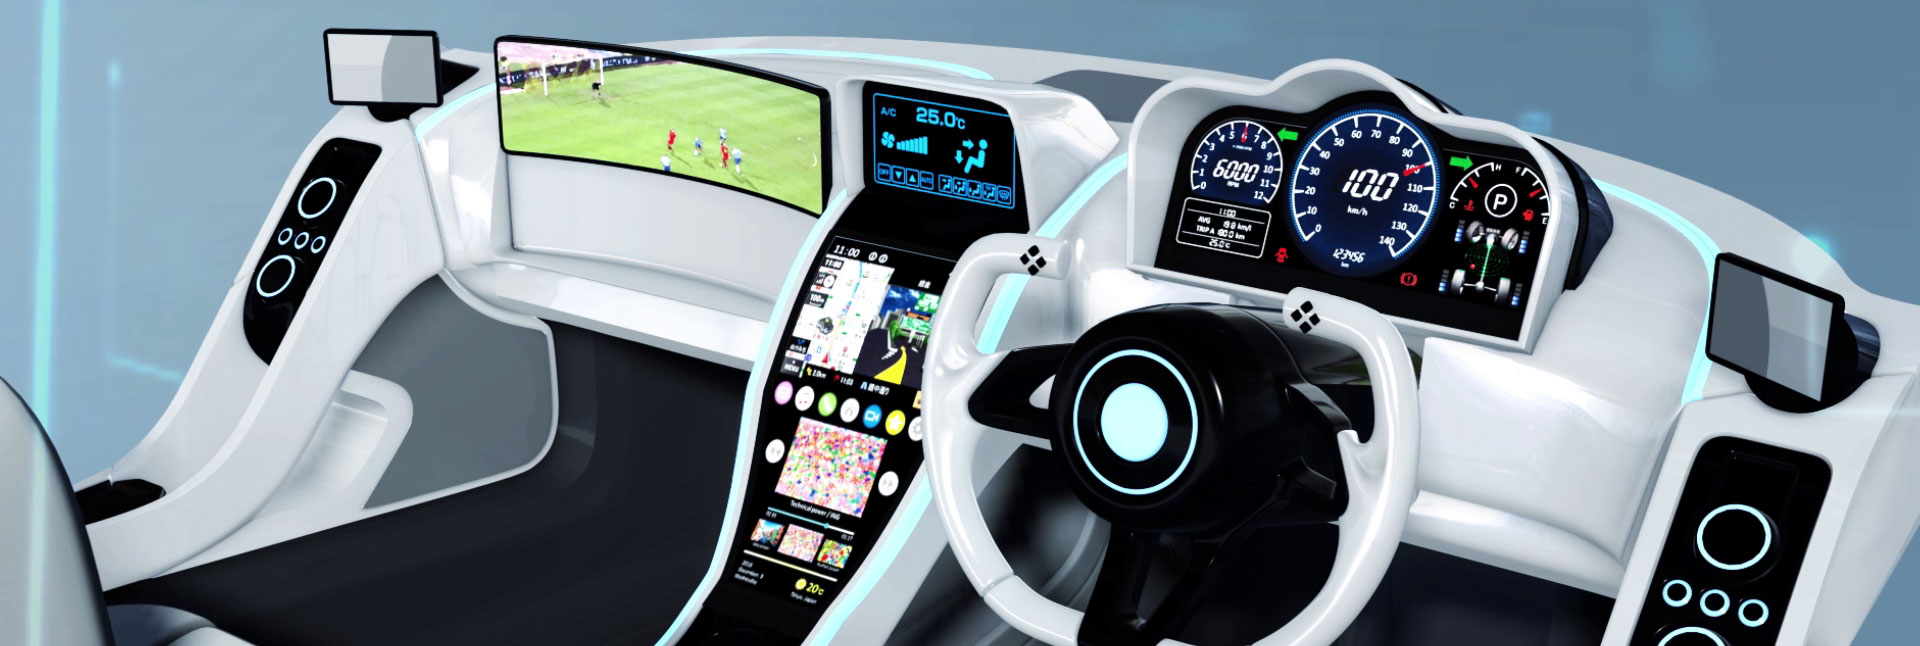 optic-bonding-optical-bonding-automotive-industry